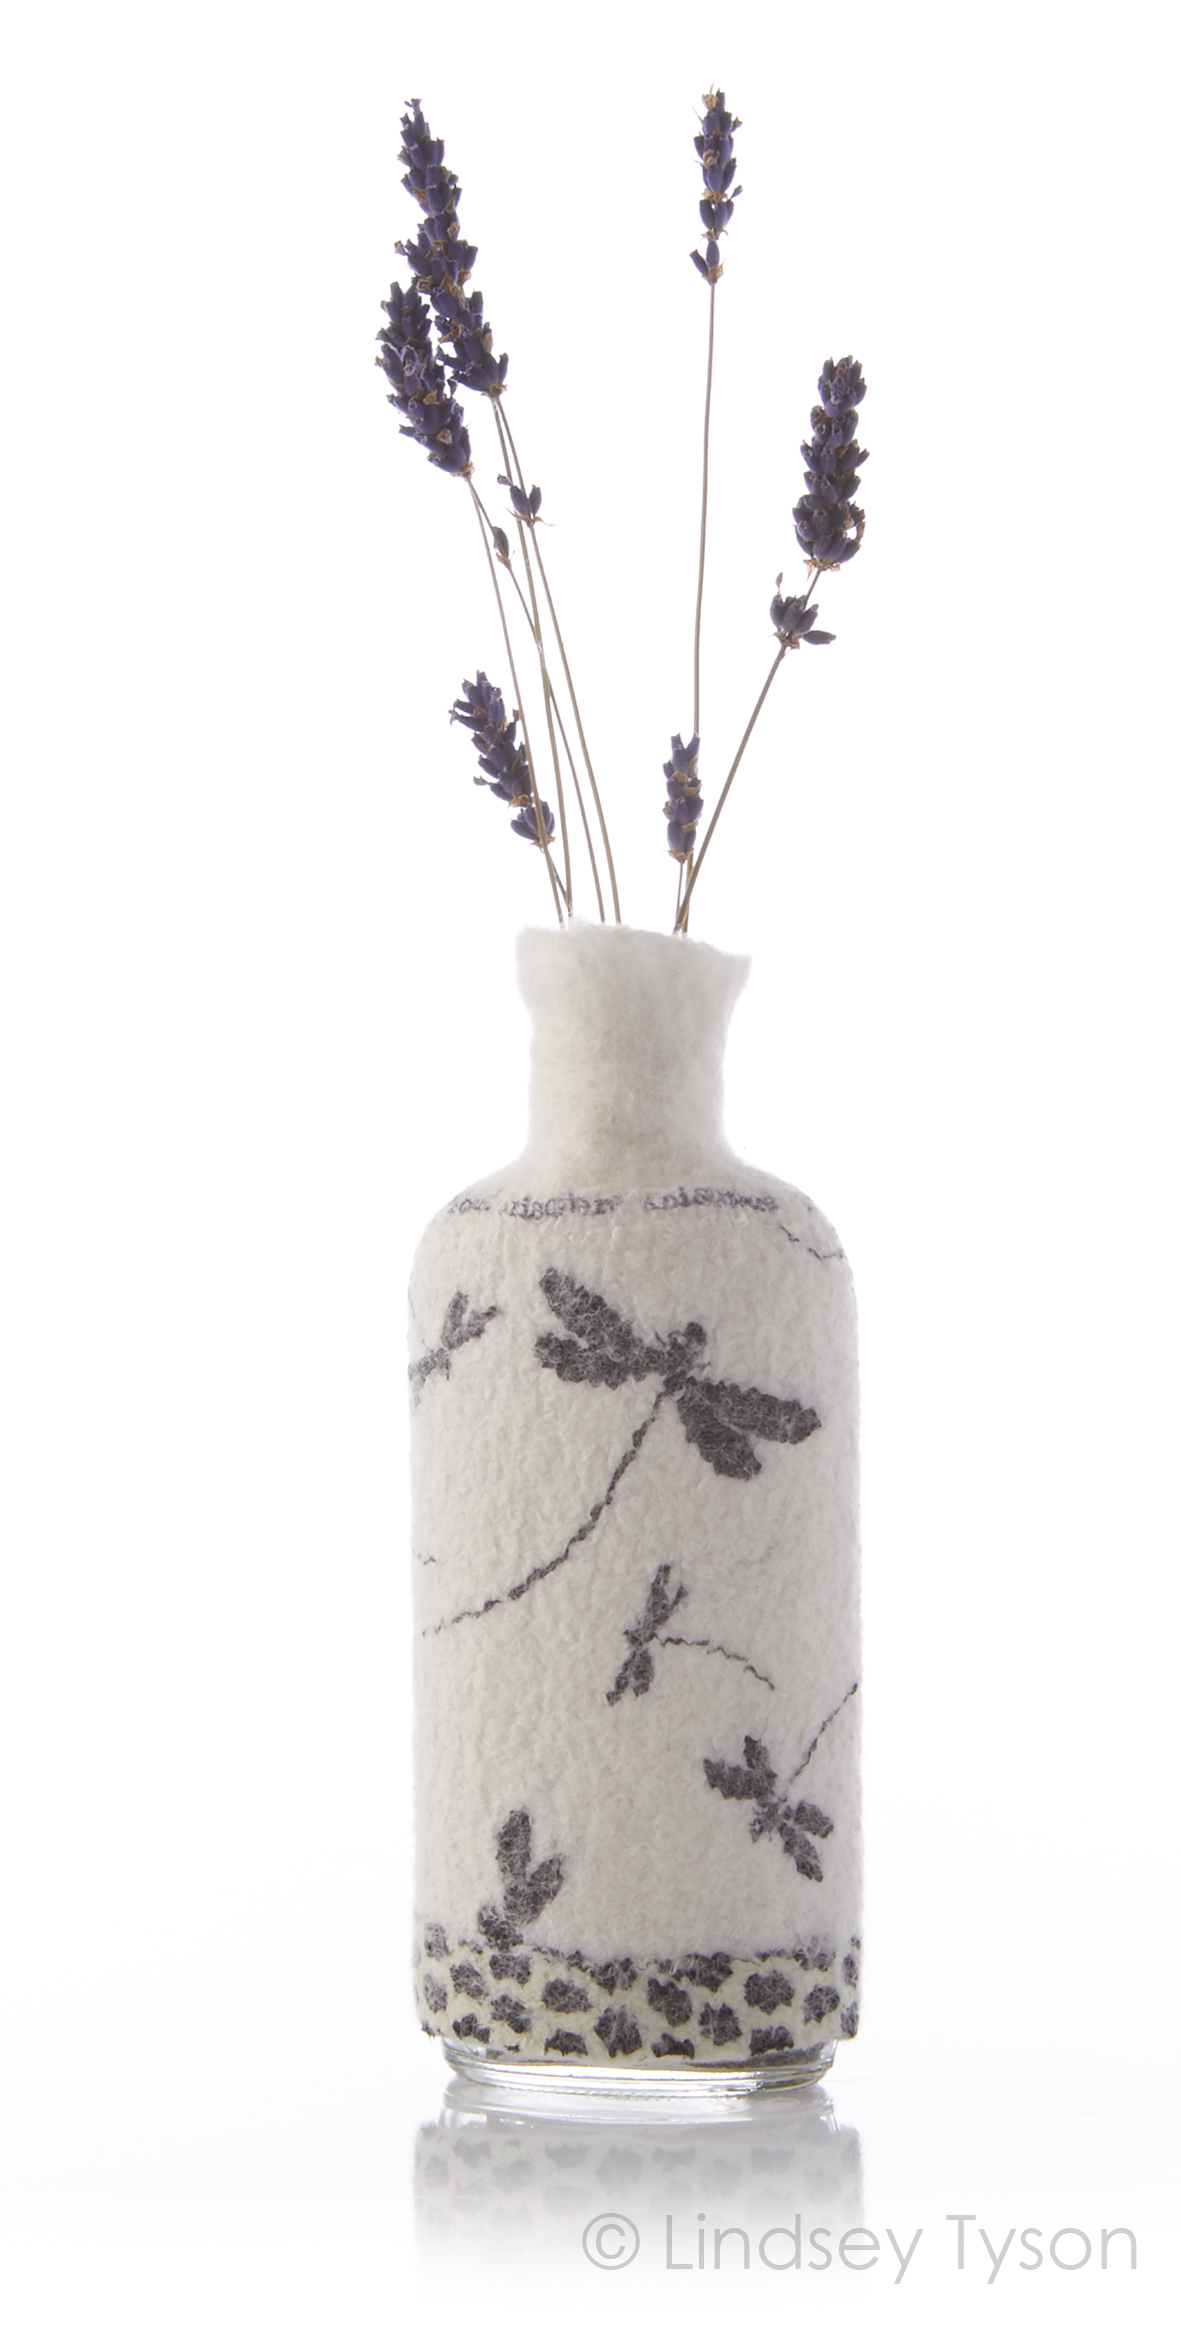 dragonfly bottle with lavender.jpg